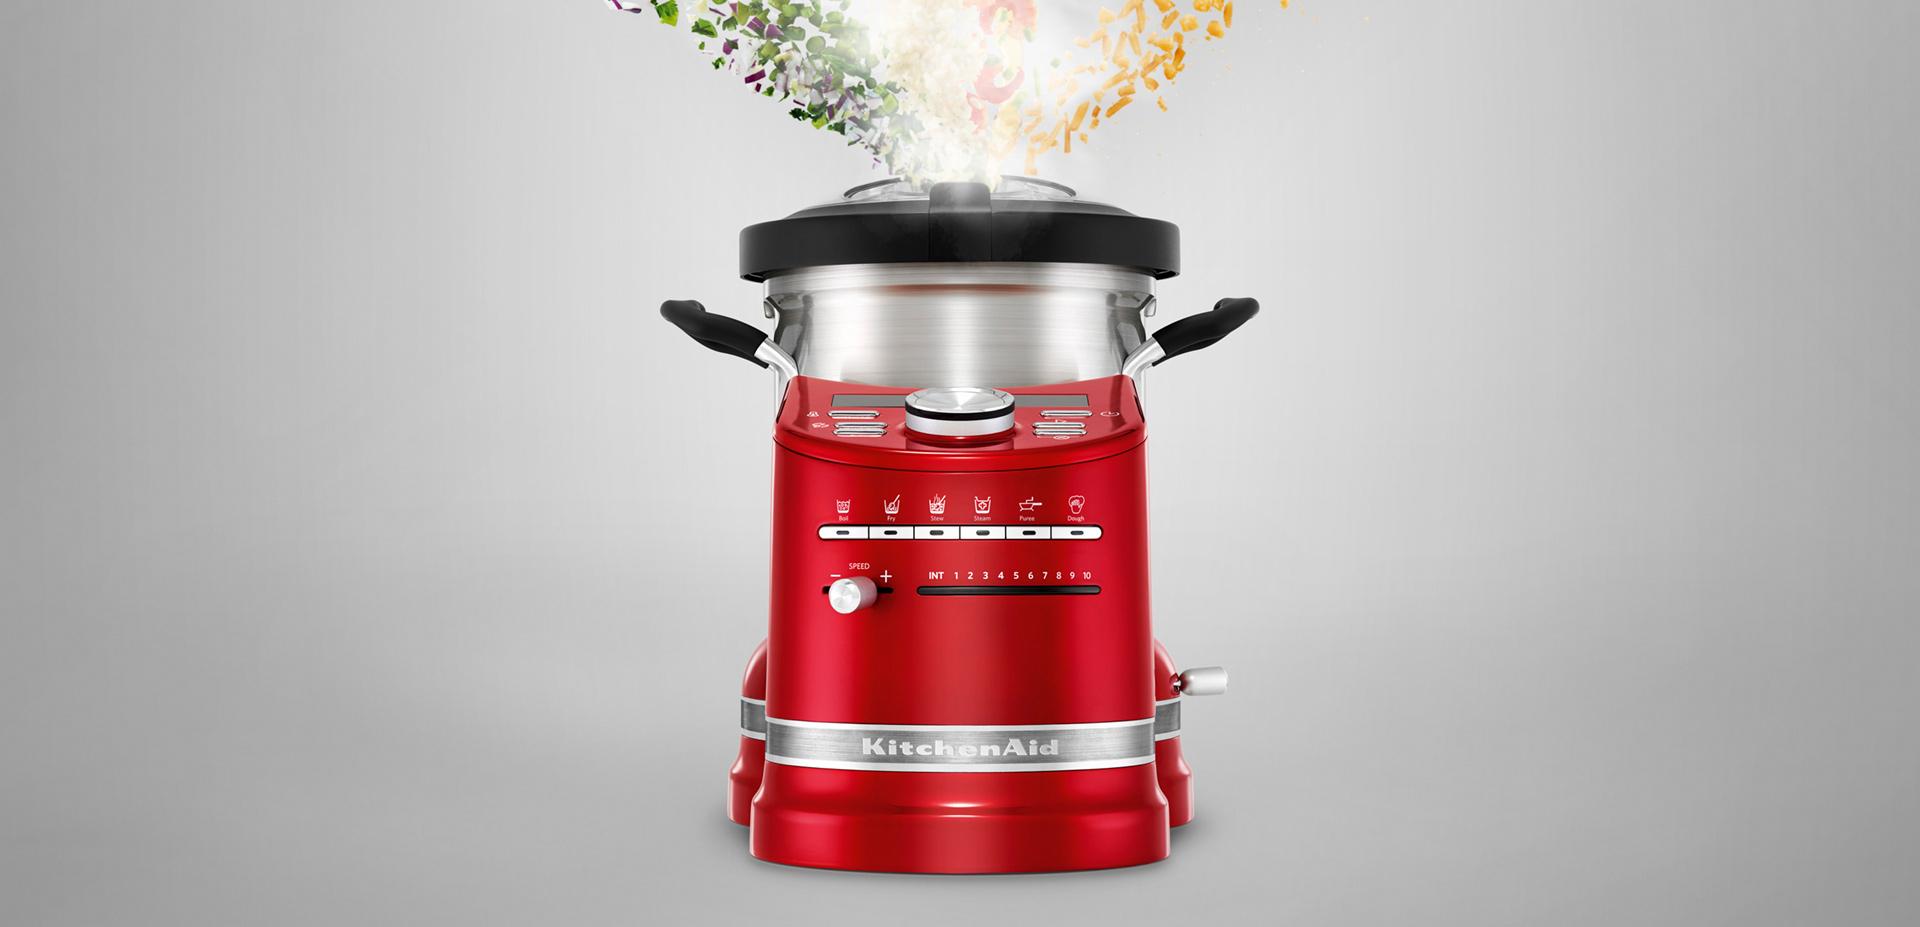 Kitchenaid robot multifunzione artisan bimby rosso for Kitchenaid artisan prezzo